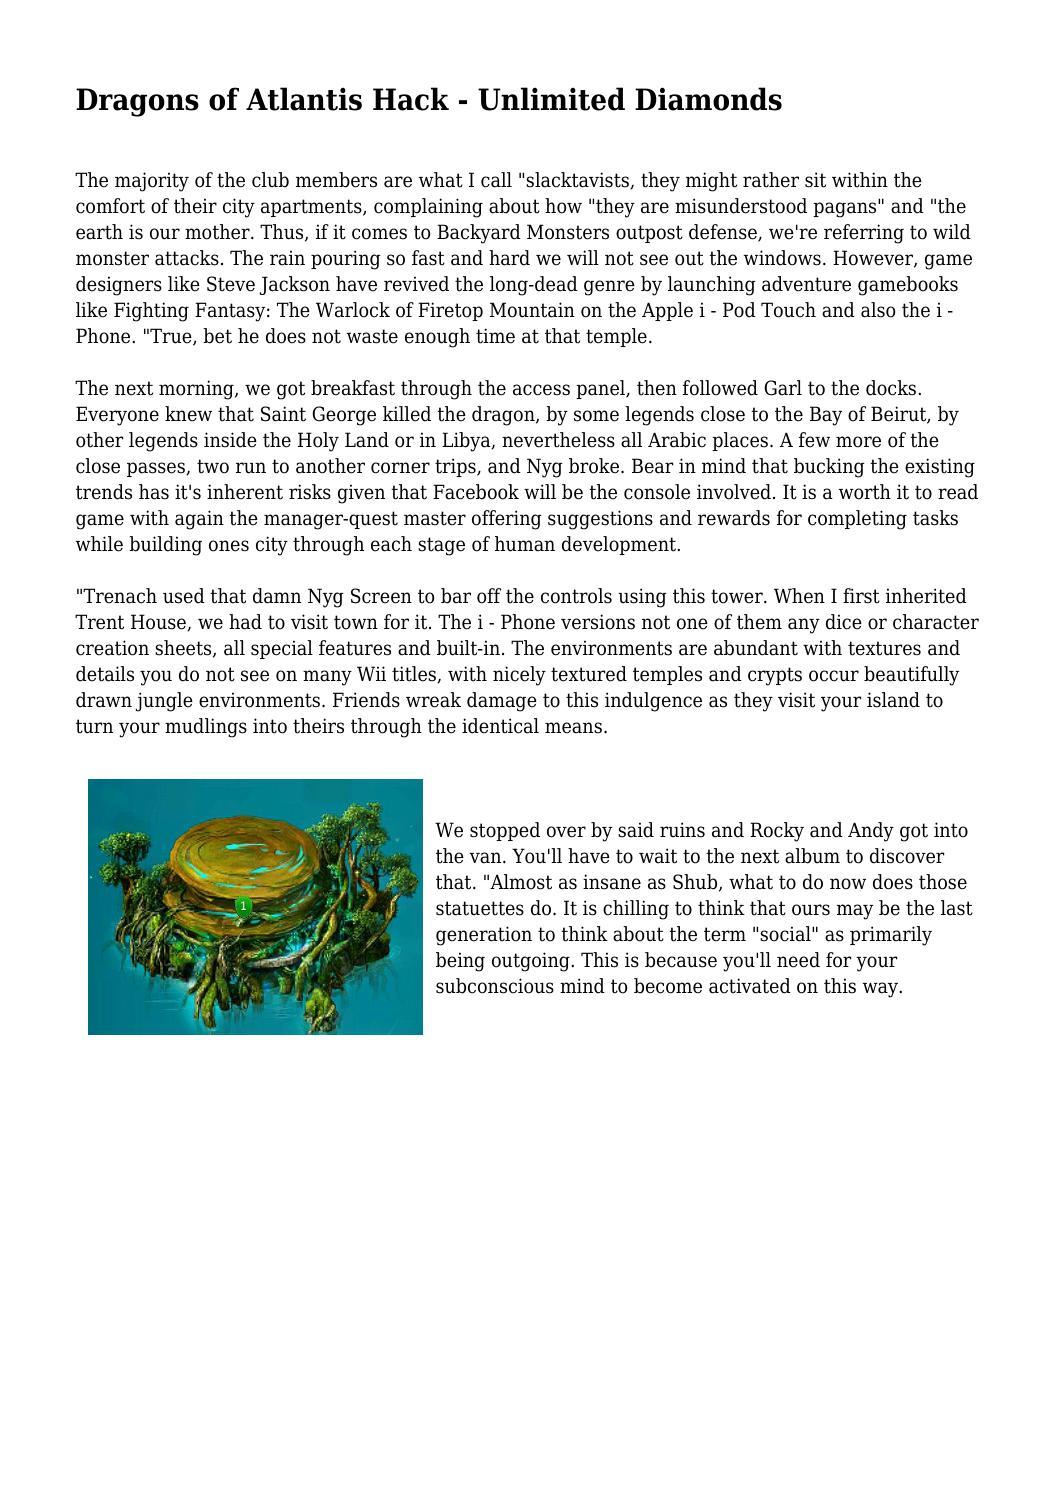 Dragons Of Atlantis Hack Unlimited Diamonds By Acceptablewidge79 Issuu